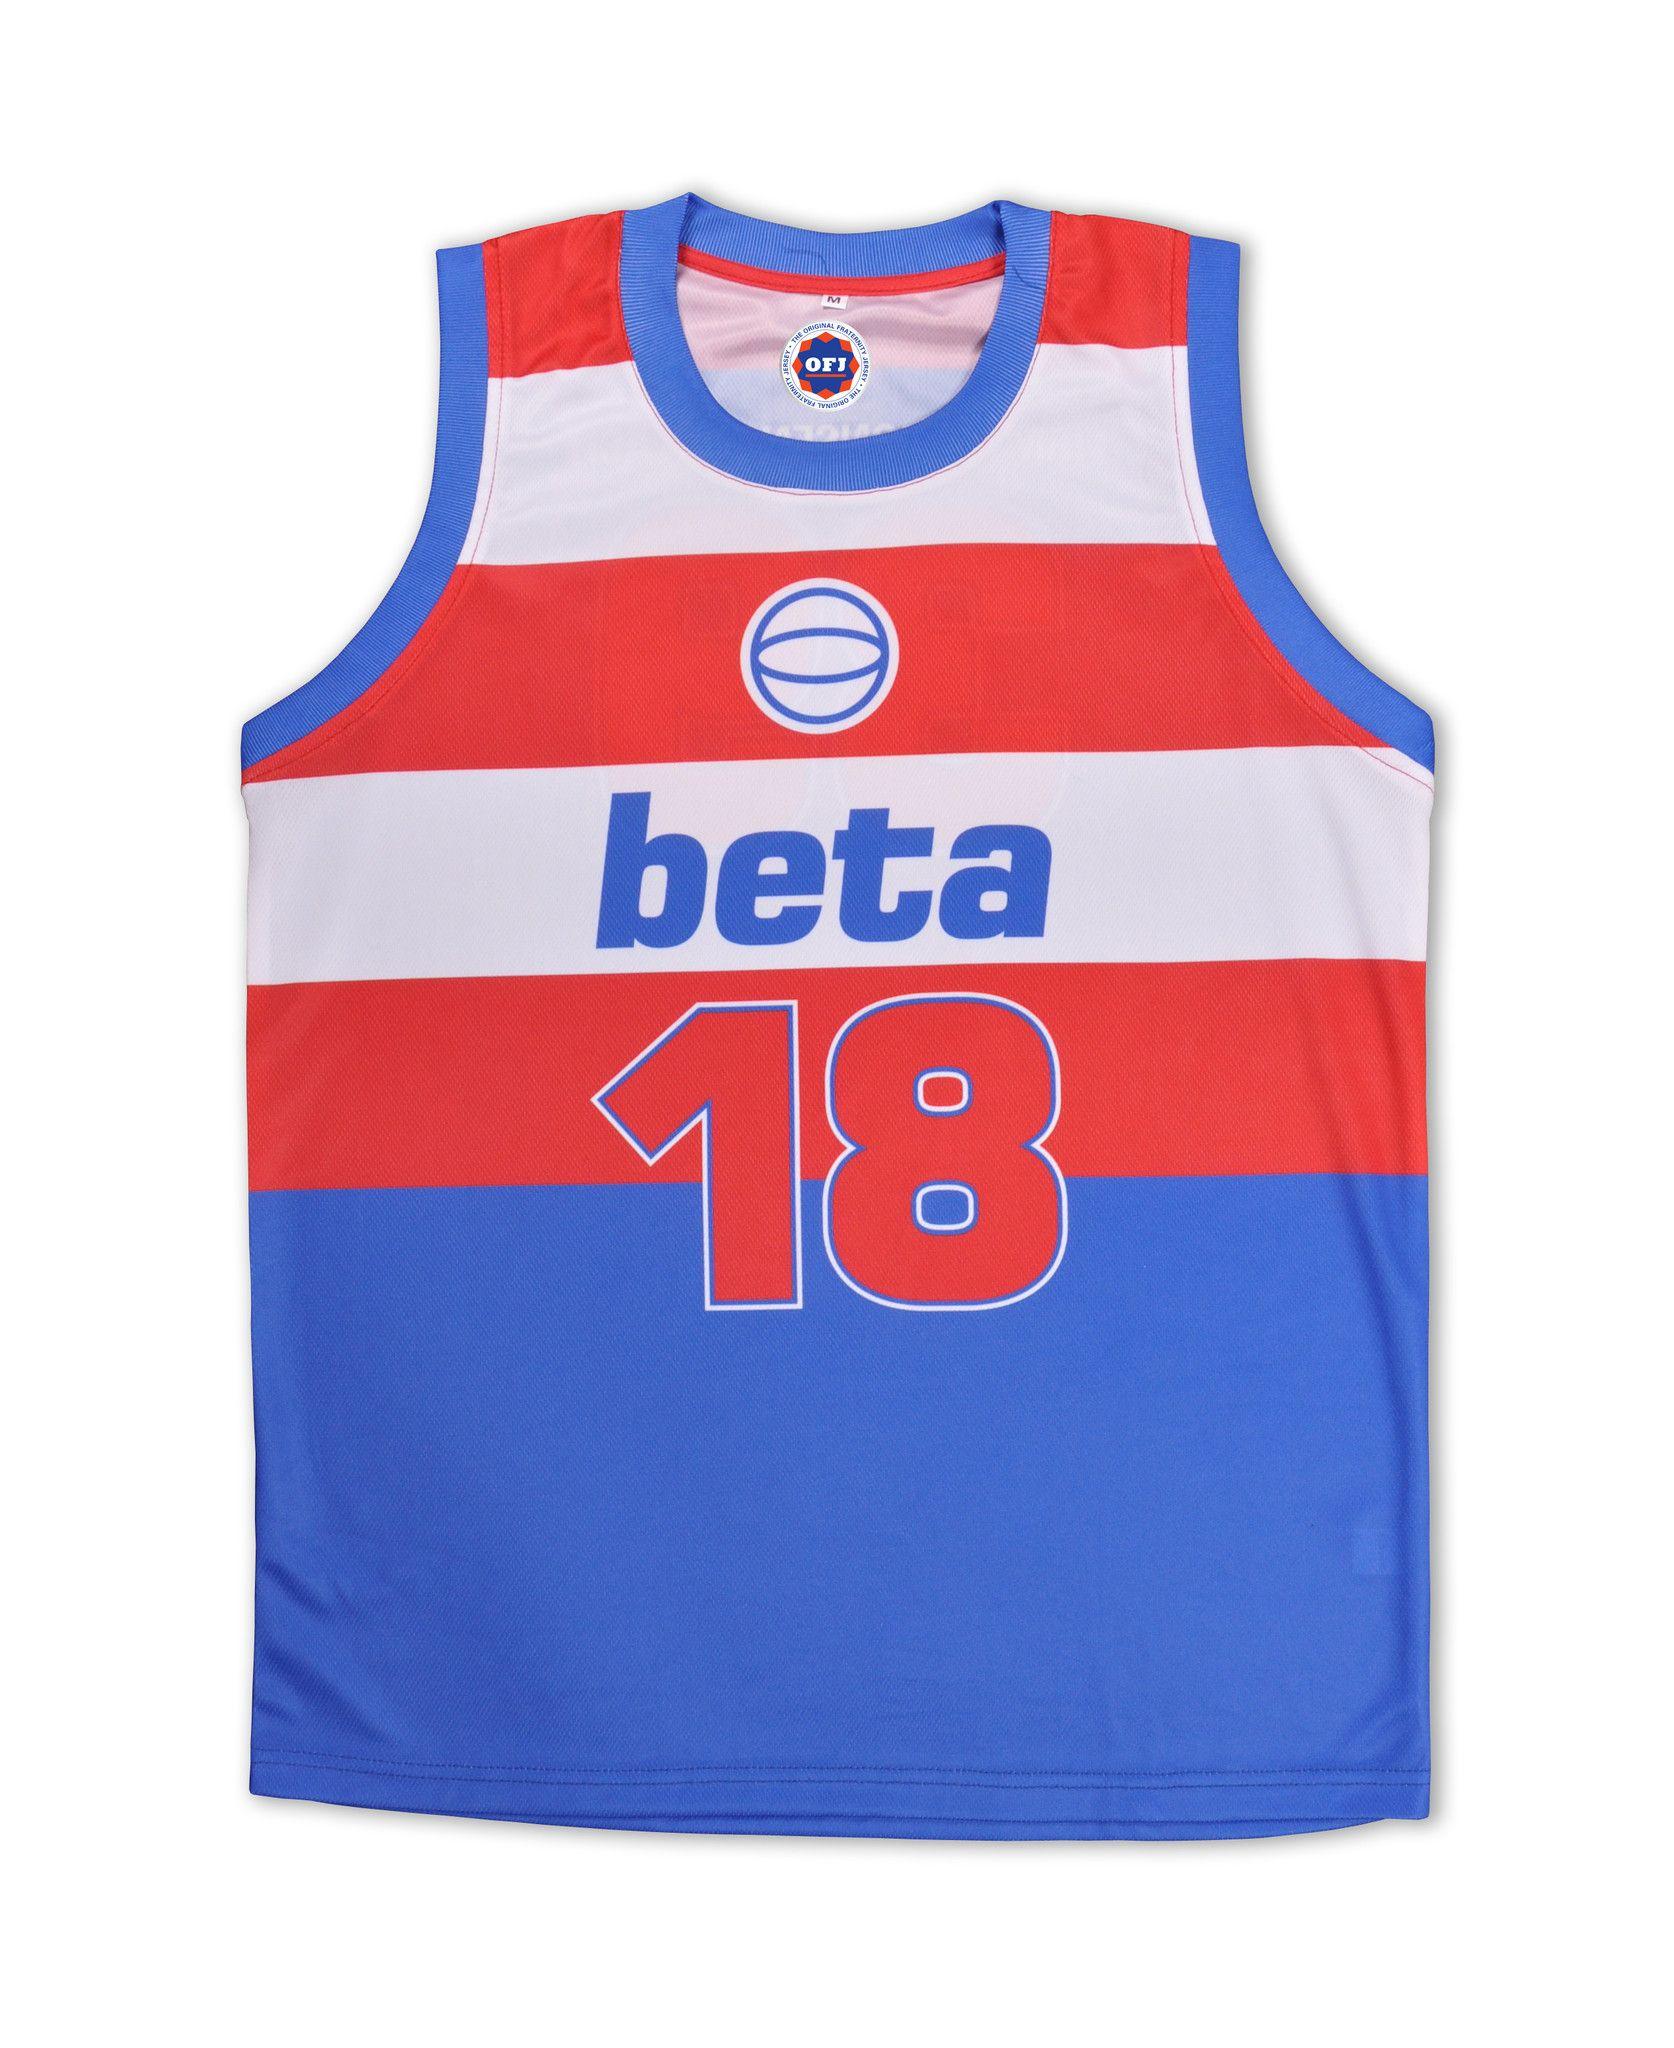 Blue apron beta - Beta Theta Pi Fraternity Jersey Size Medium Fraternityaproncollege